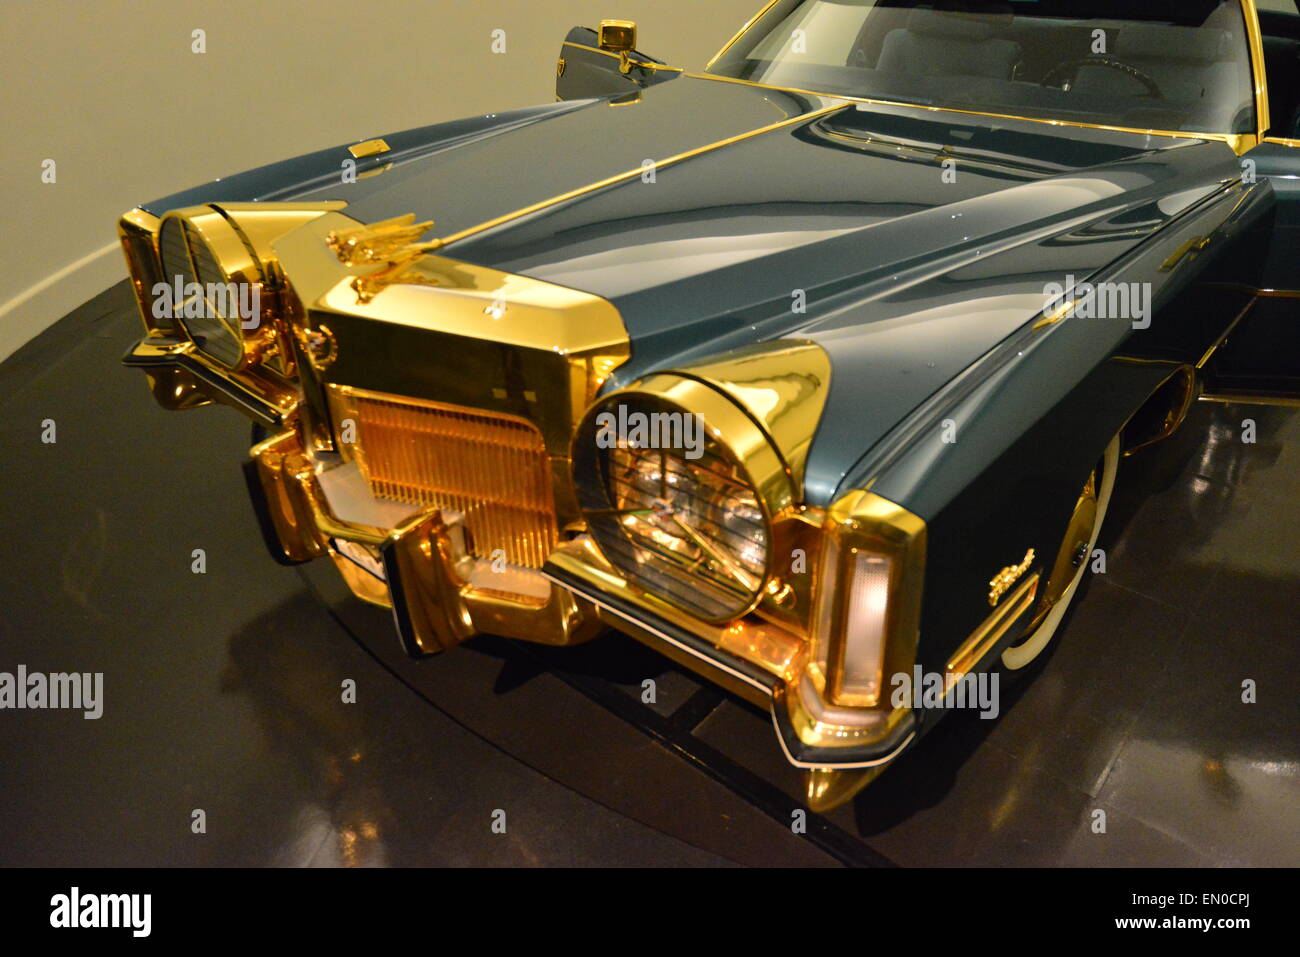 Isaac Hayes Gold Plated Cadillac Eldorado Stock Photo 81759290 Alamy